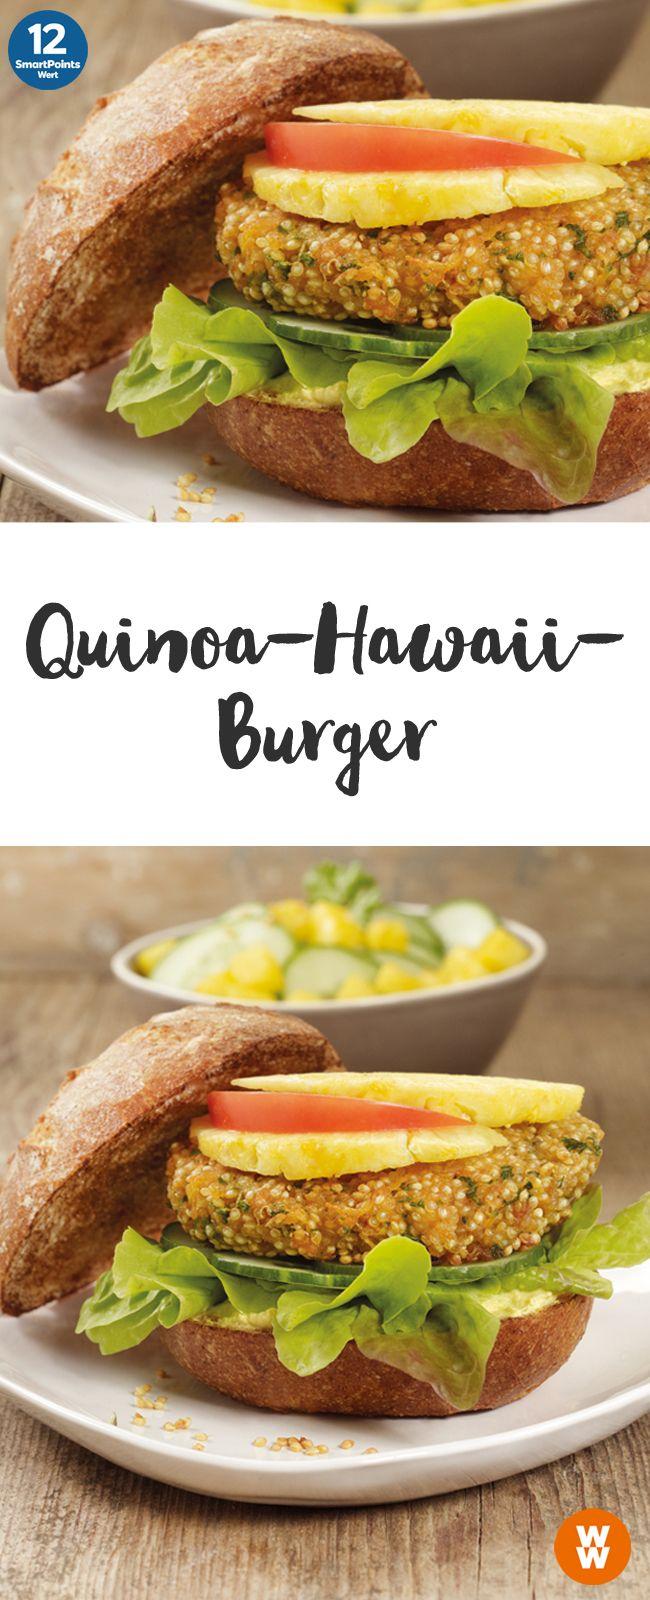 Quinoa-Hawaii-Burger | 2 Portionen, 12 SmartPoints/Portion, Weight Watchers, fertig in 40 min.